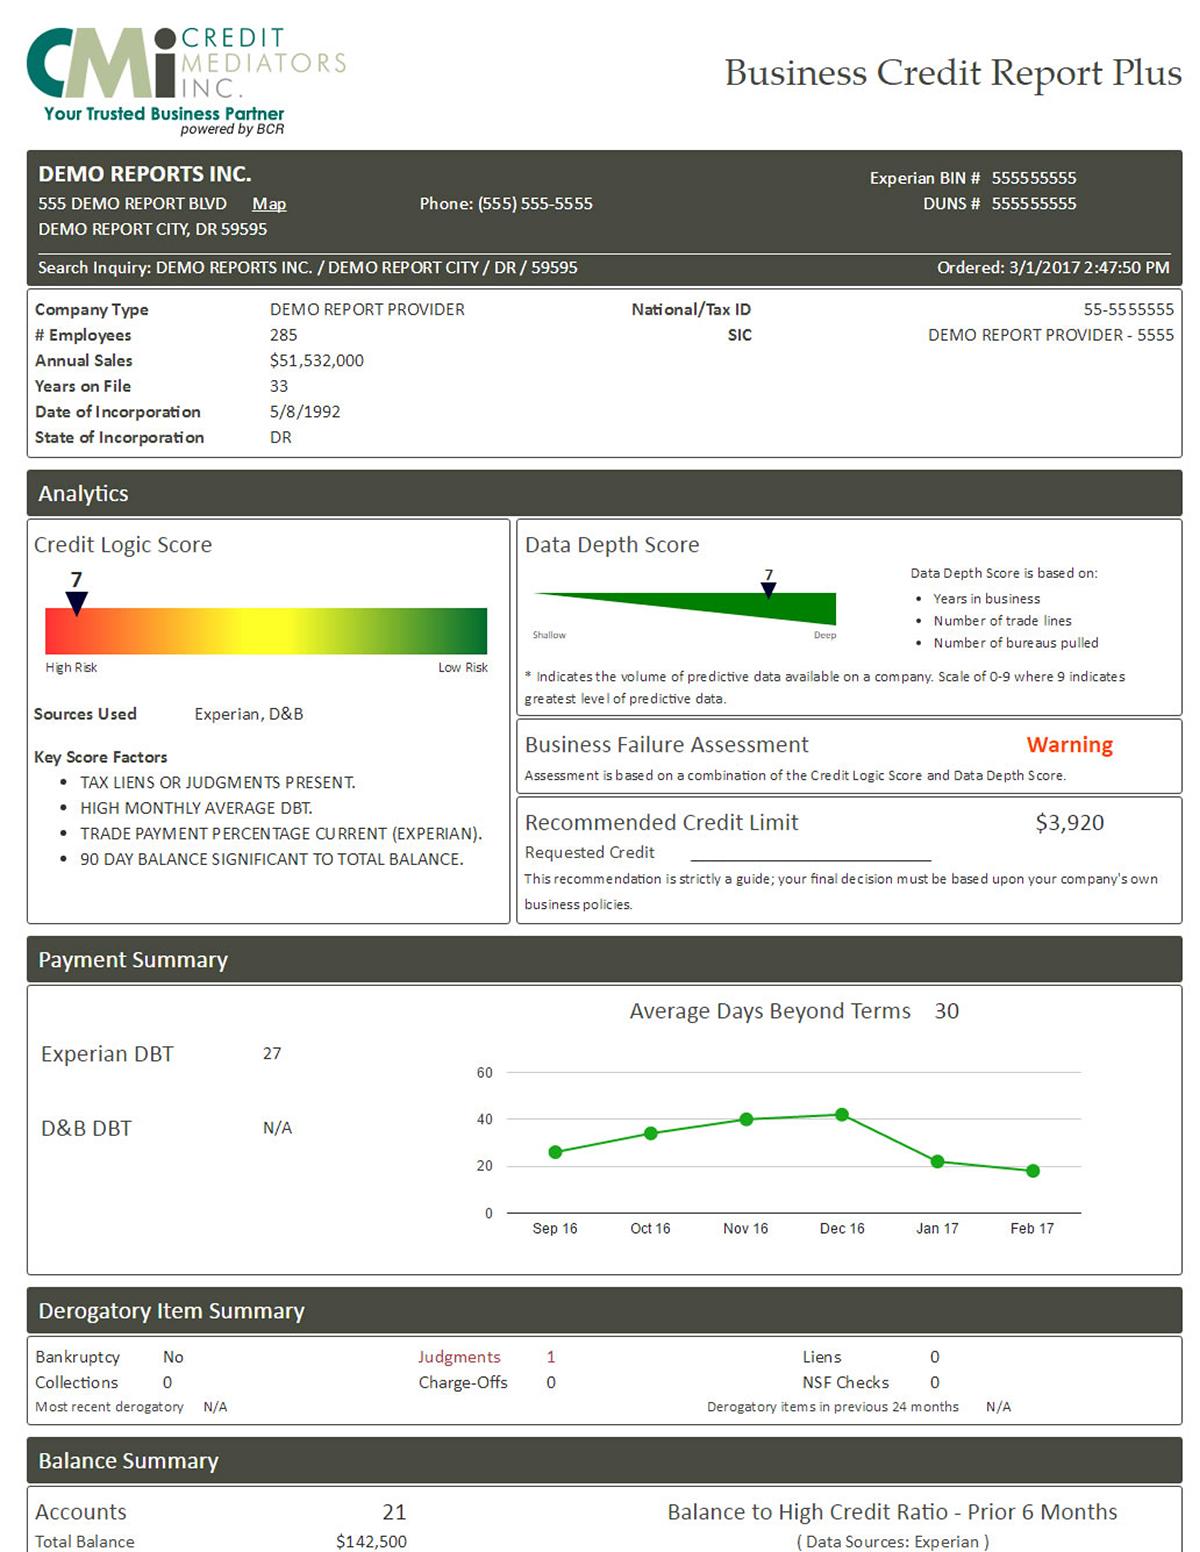 Order a Business Credit Report Plus - Credit Mediators Inc.